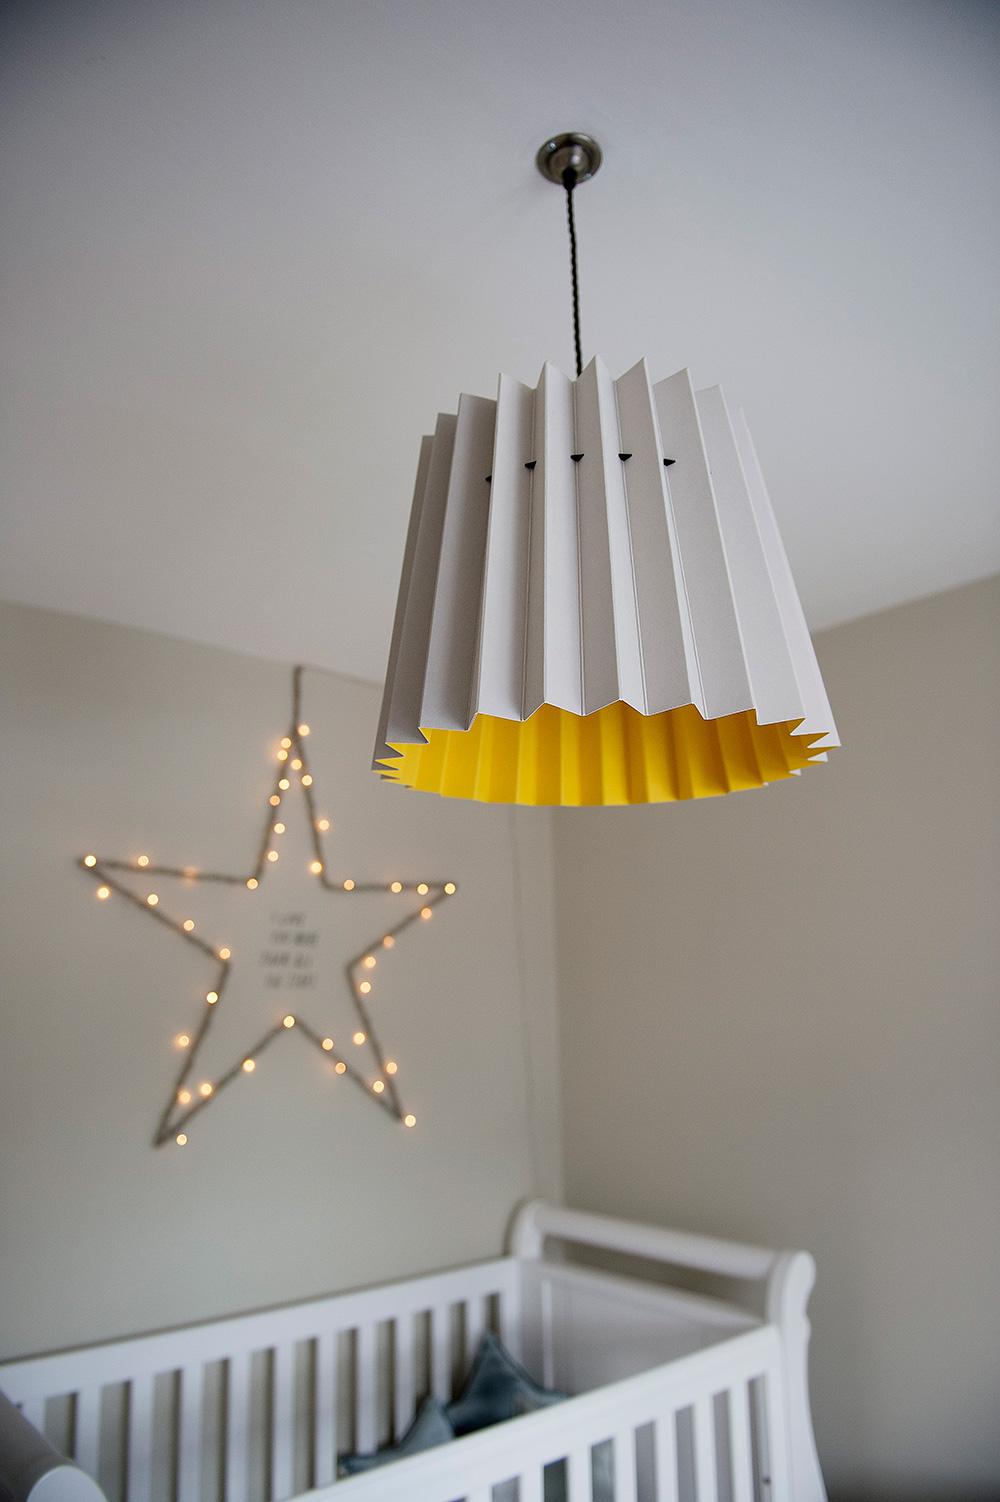 1-nikki-rees-nursery-light-design-kids-interiors-interior-design-wimbledon-london-surrey-2